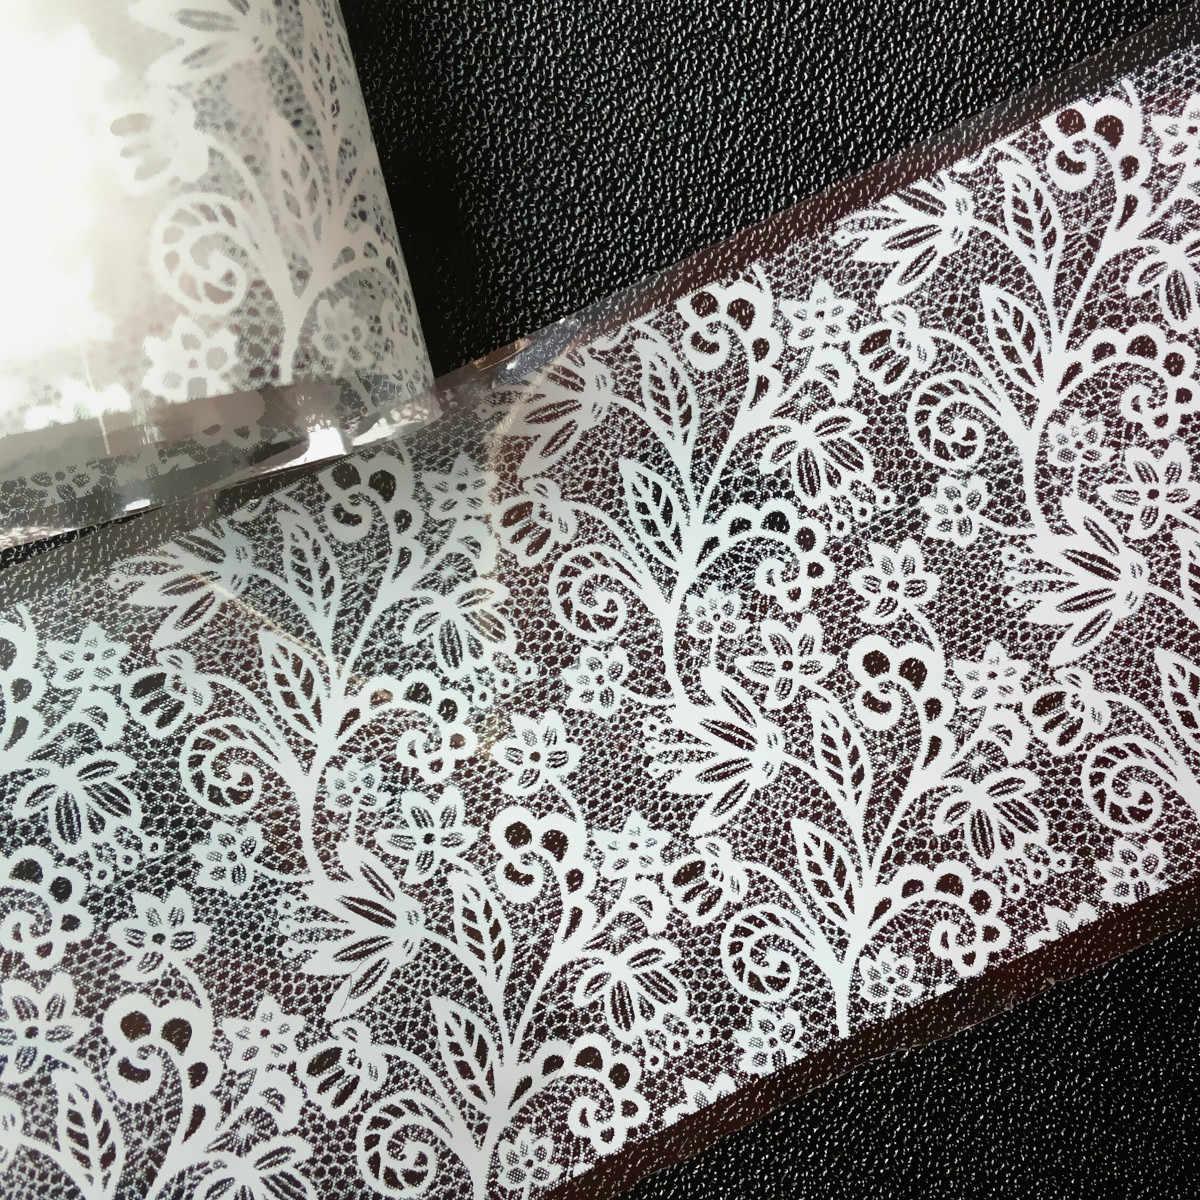 Seksi Putih Renda Grid Kuku Foil Tips Besar Bunga Kuku Transfer Stiker DIY Seni Menghias Kuku Lem Bahasa Polandia Aksesoris SK046